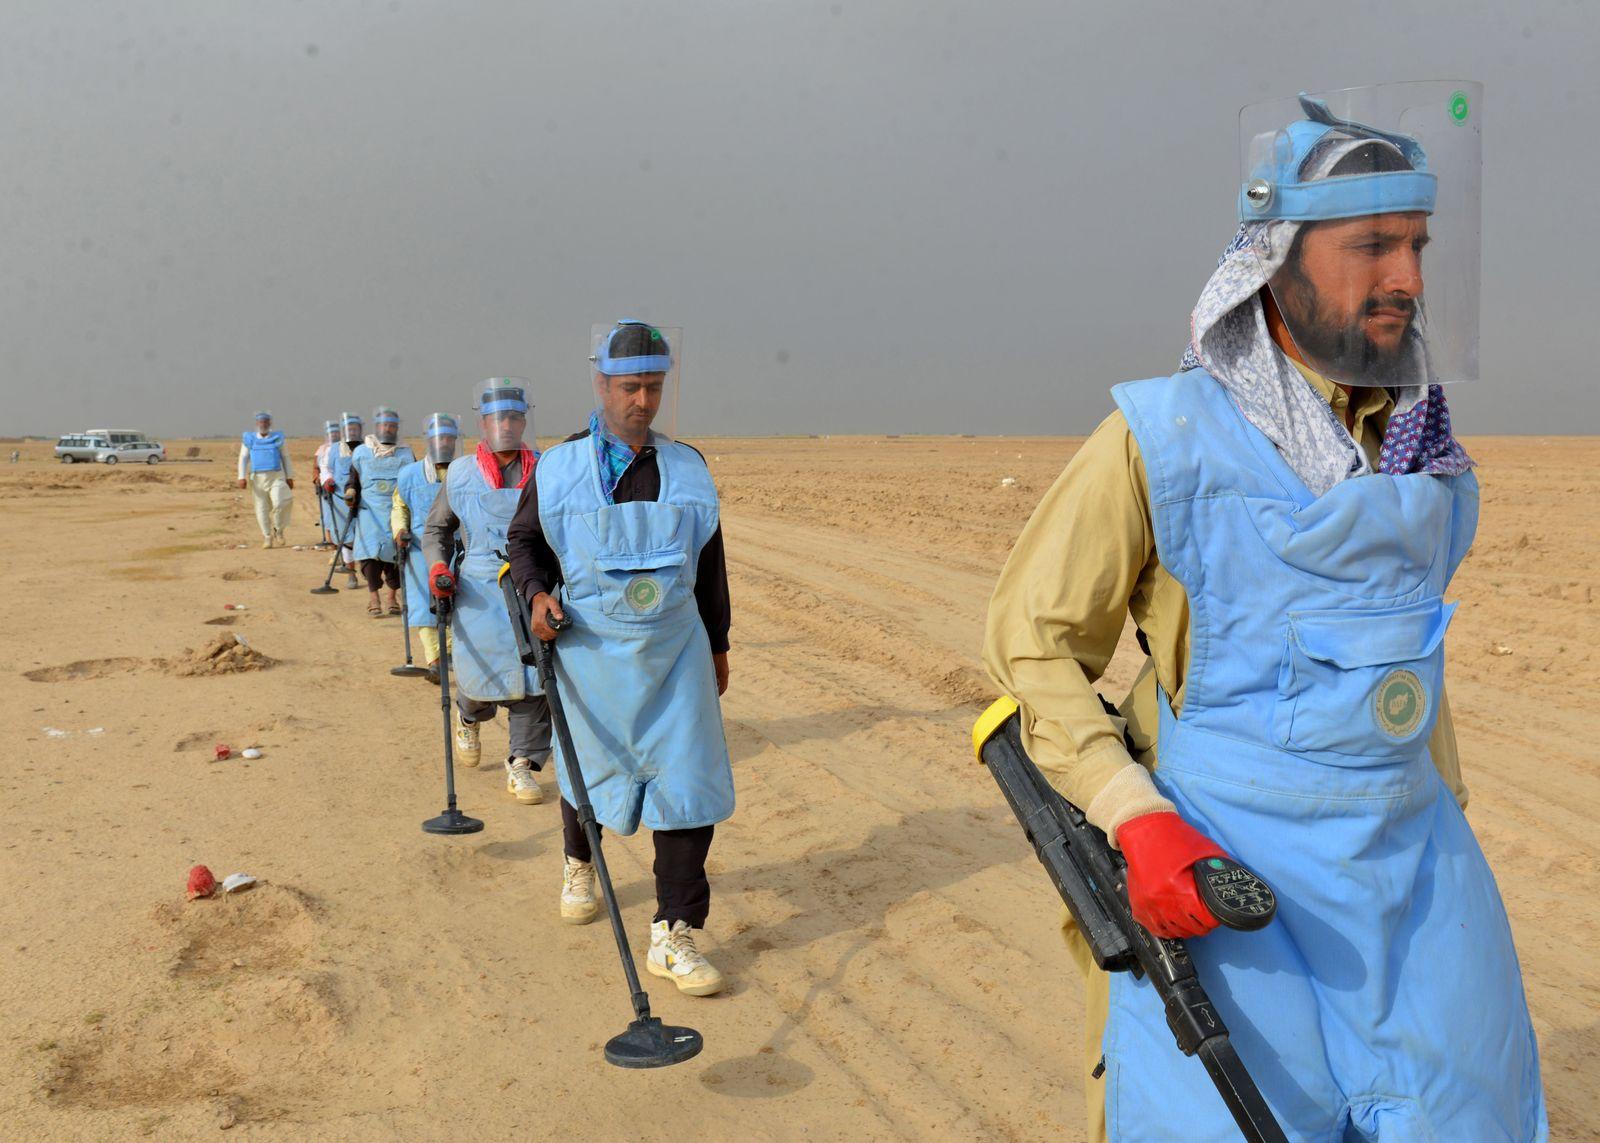 Landminen in Afghanistan